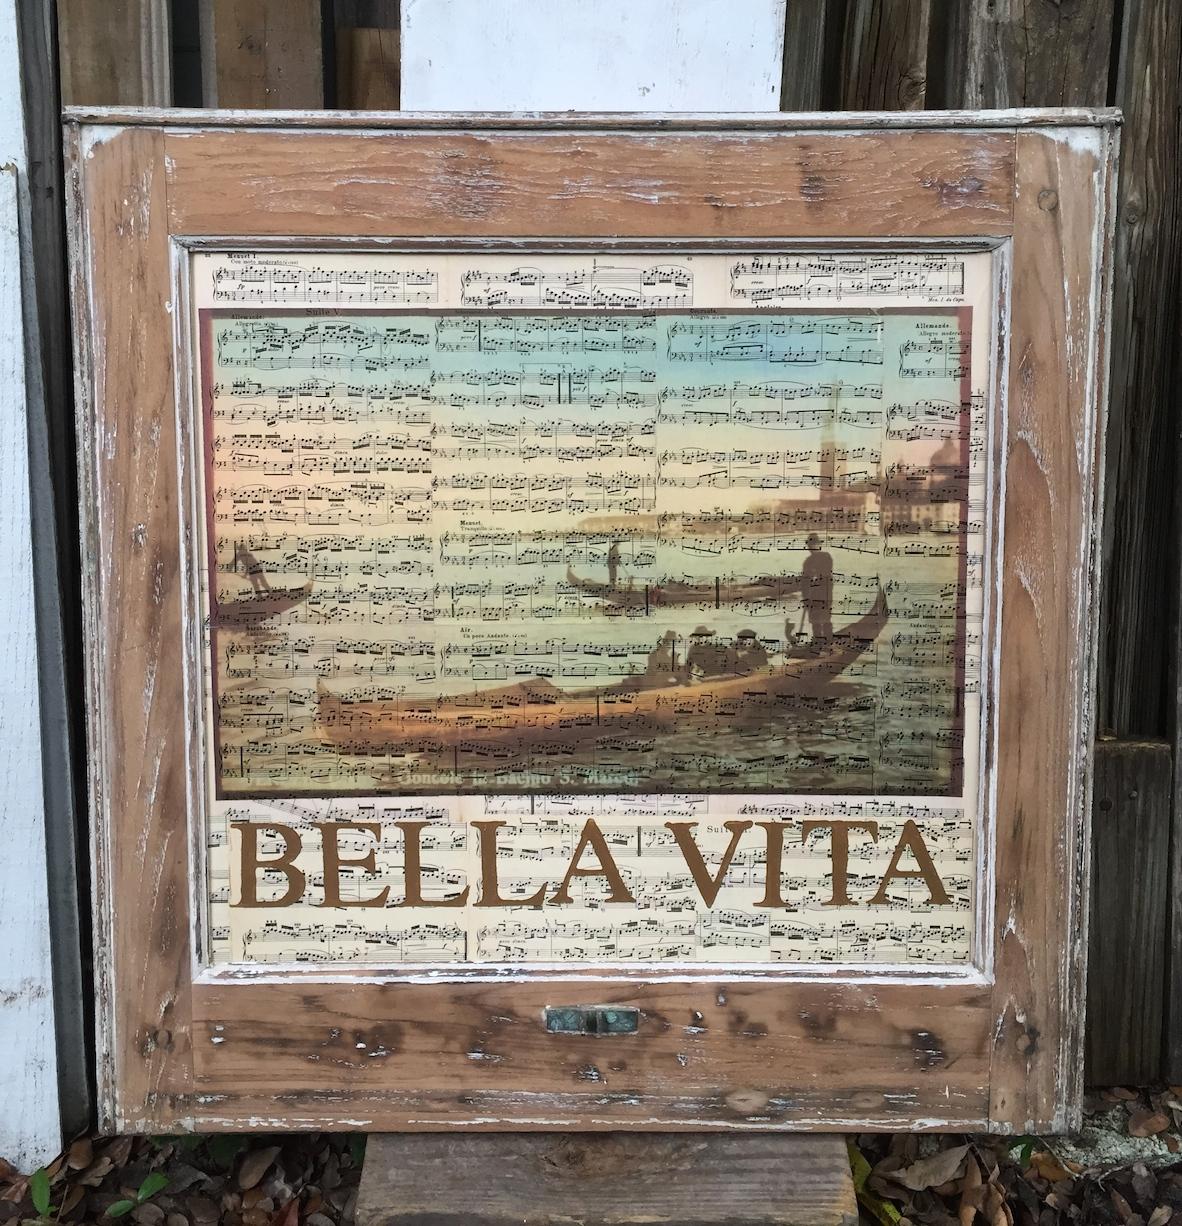 Bella Vita.Photo courtesy of Kerry Topjun